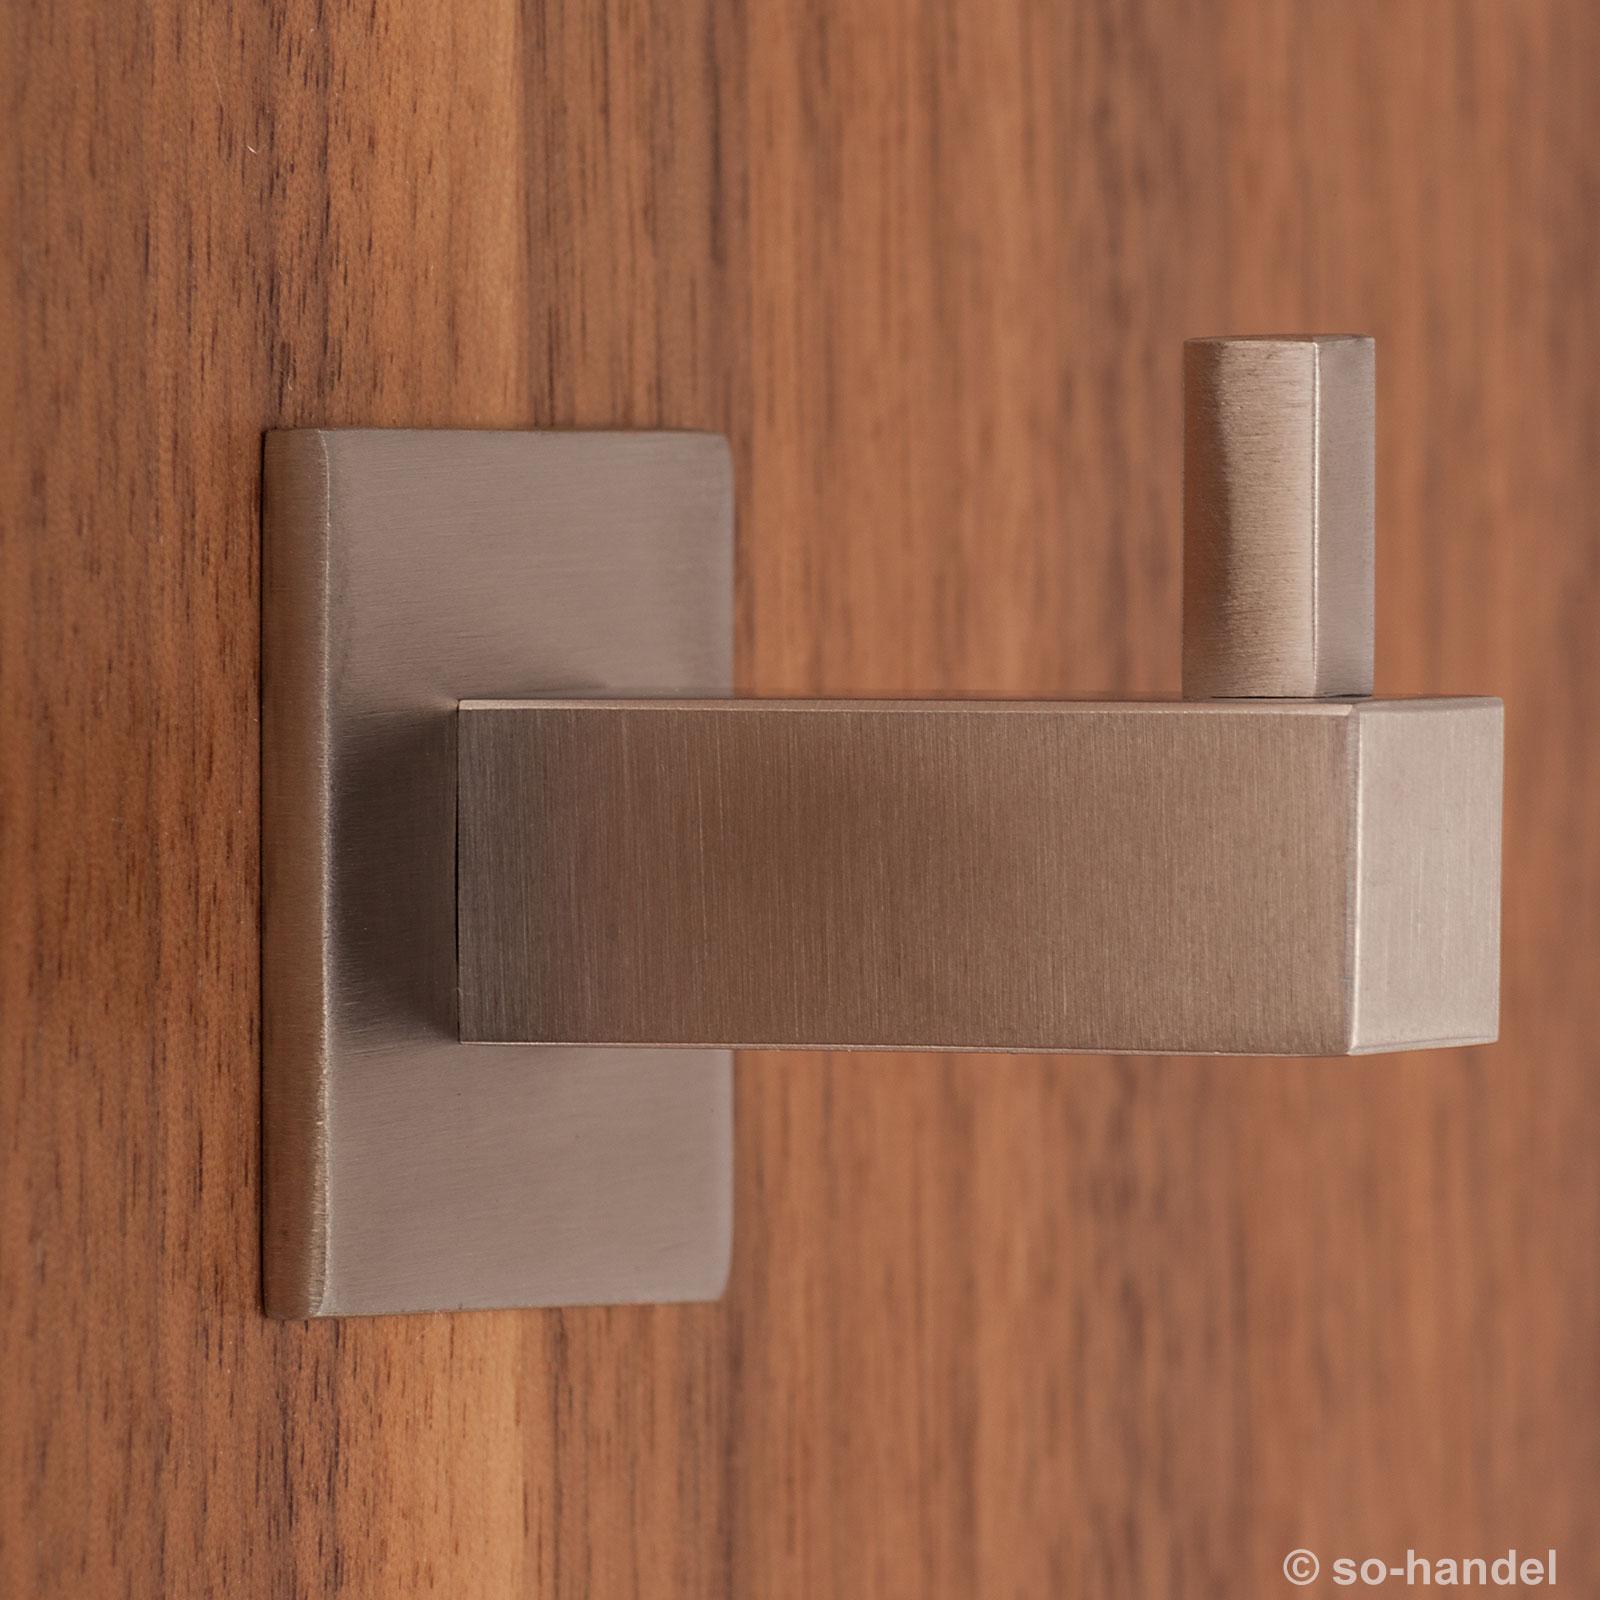 kleiderhaken edelstahl garderobenhaken wandhaken. Black Bedroom Furniture Sets. Home Design Ideas